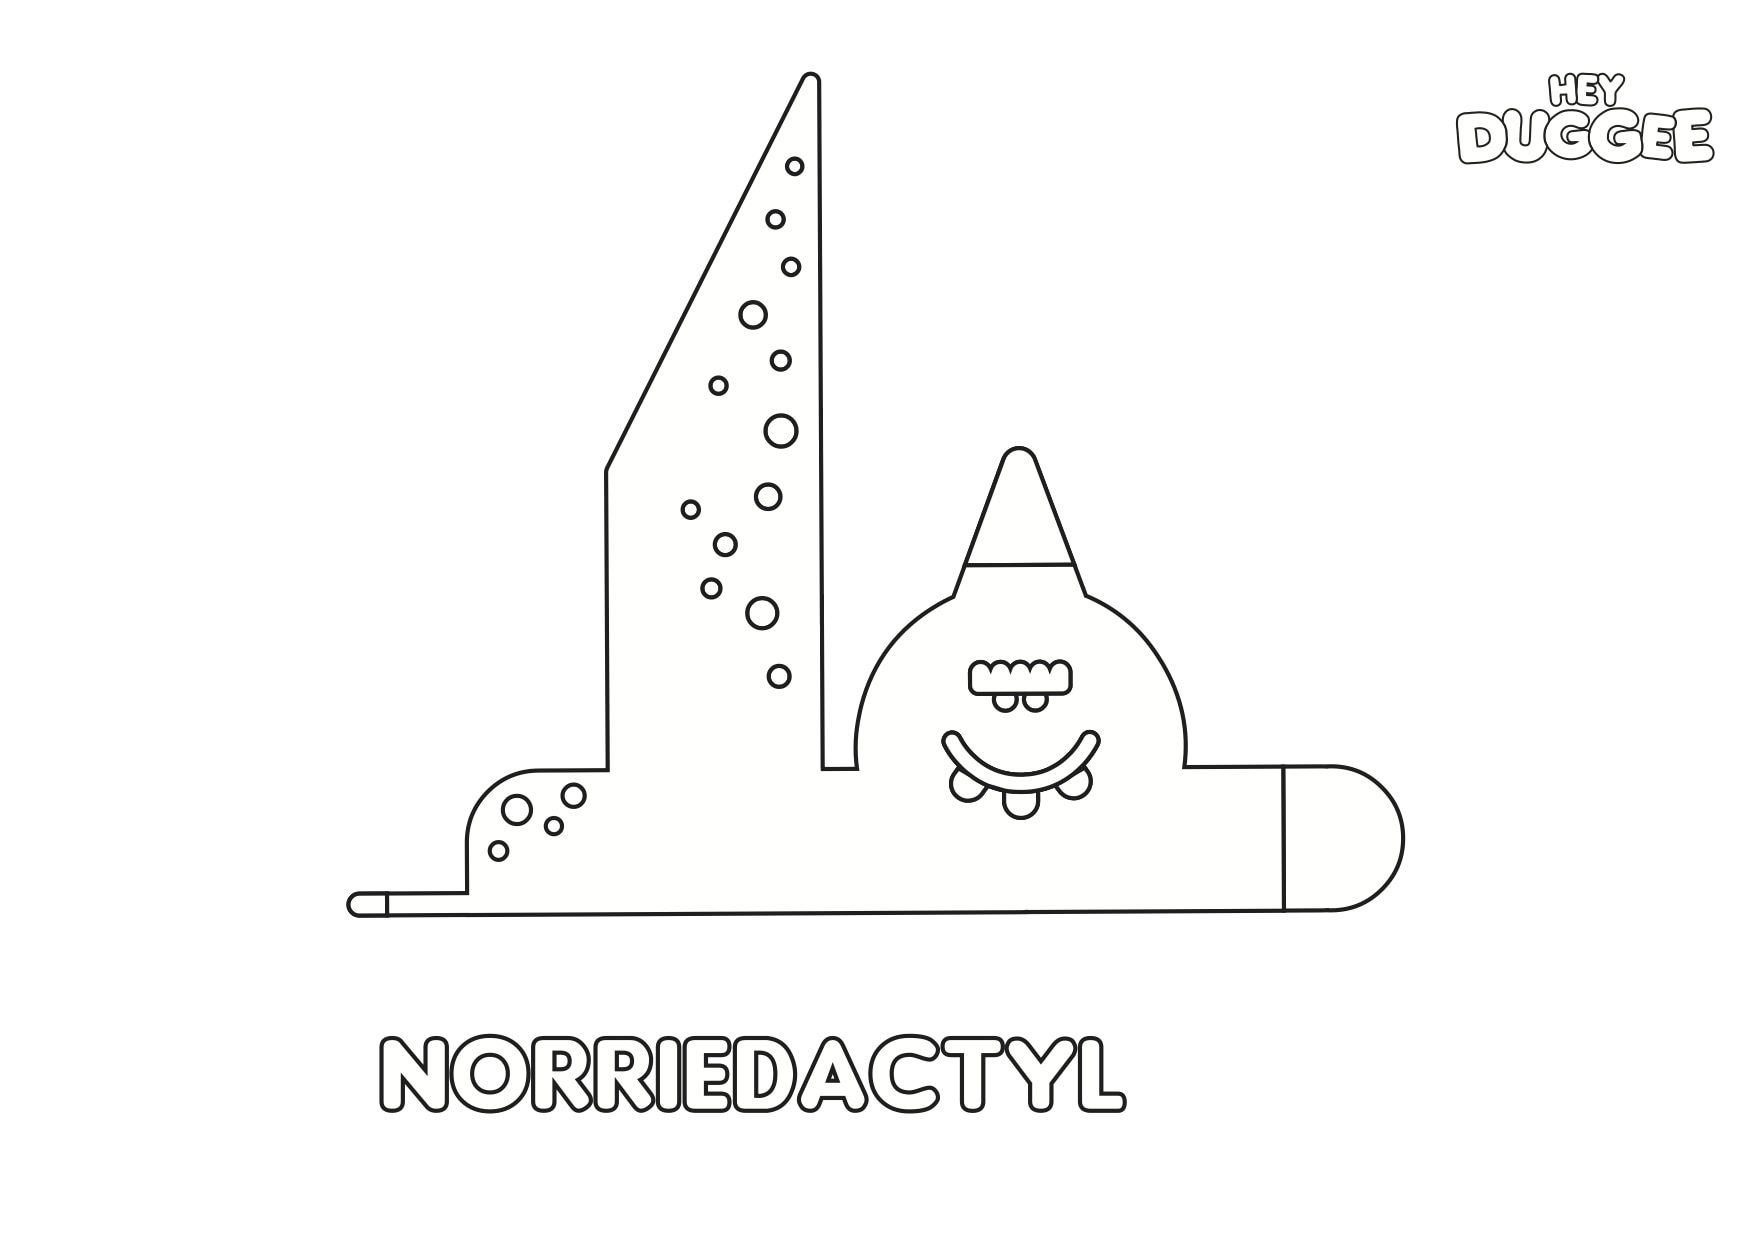 norriedactyl